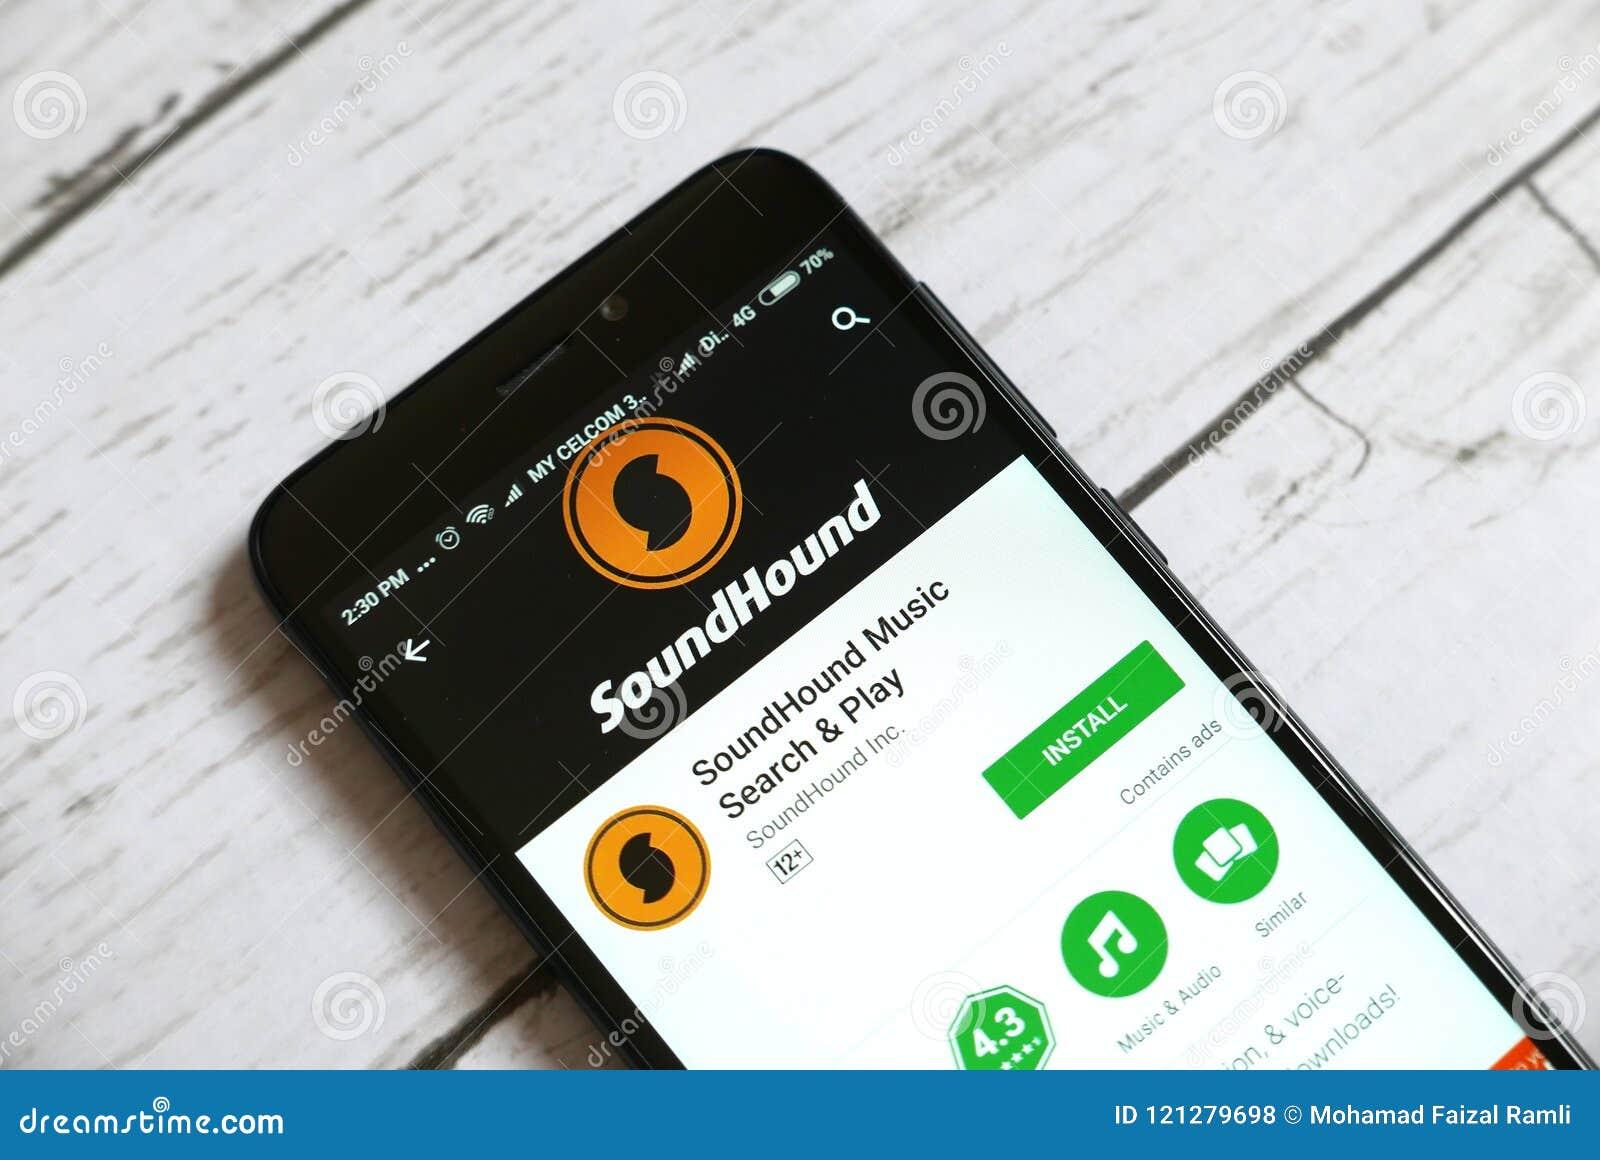 Soundhound Music